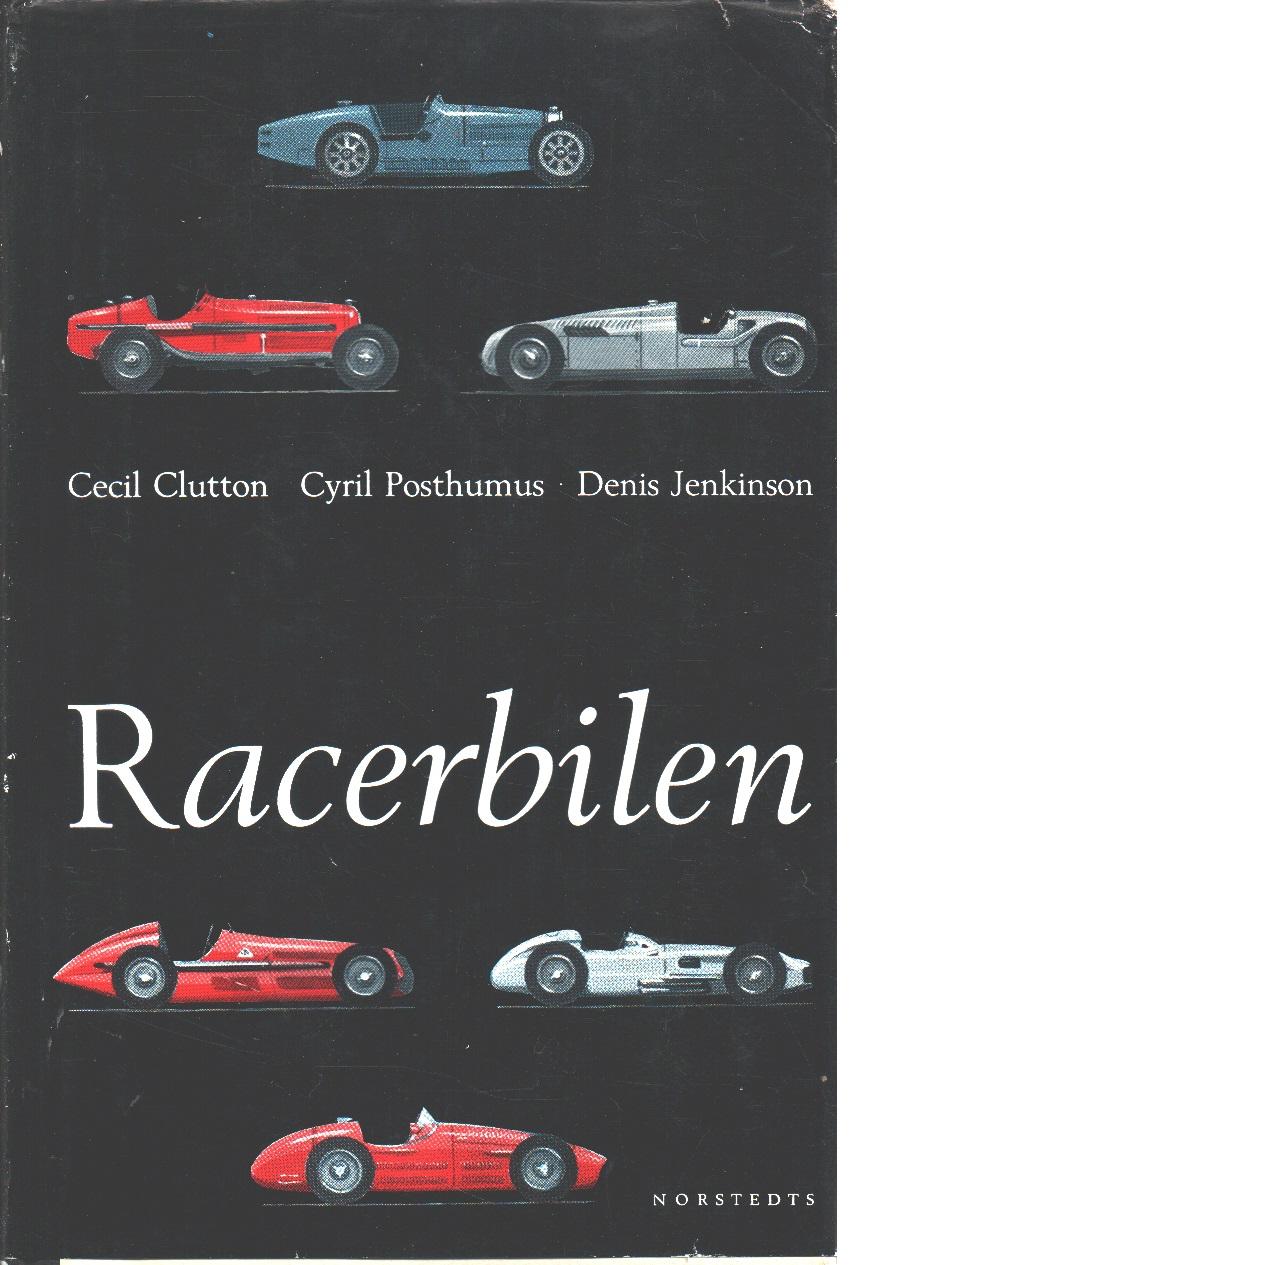 Racerbilen - Clutton, Cecil Och Posthumus, Cyril Samt Jenkinson, Denis